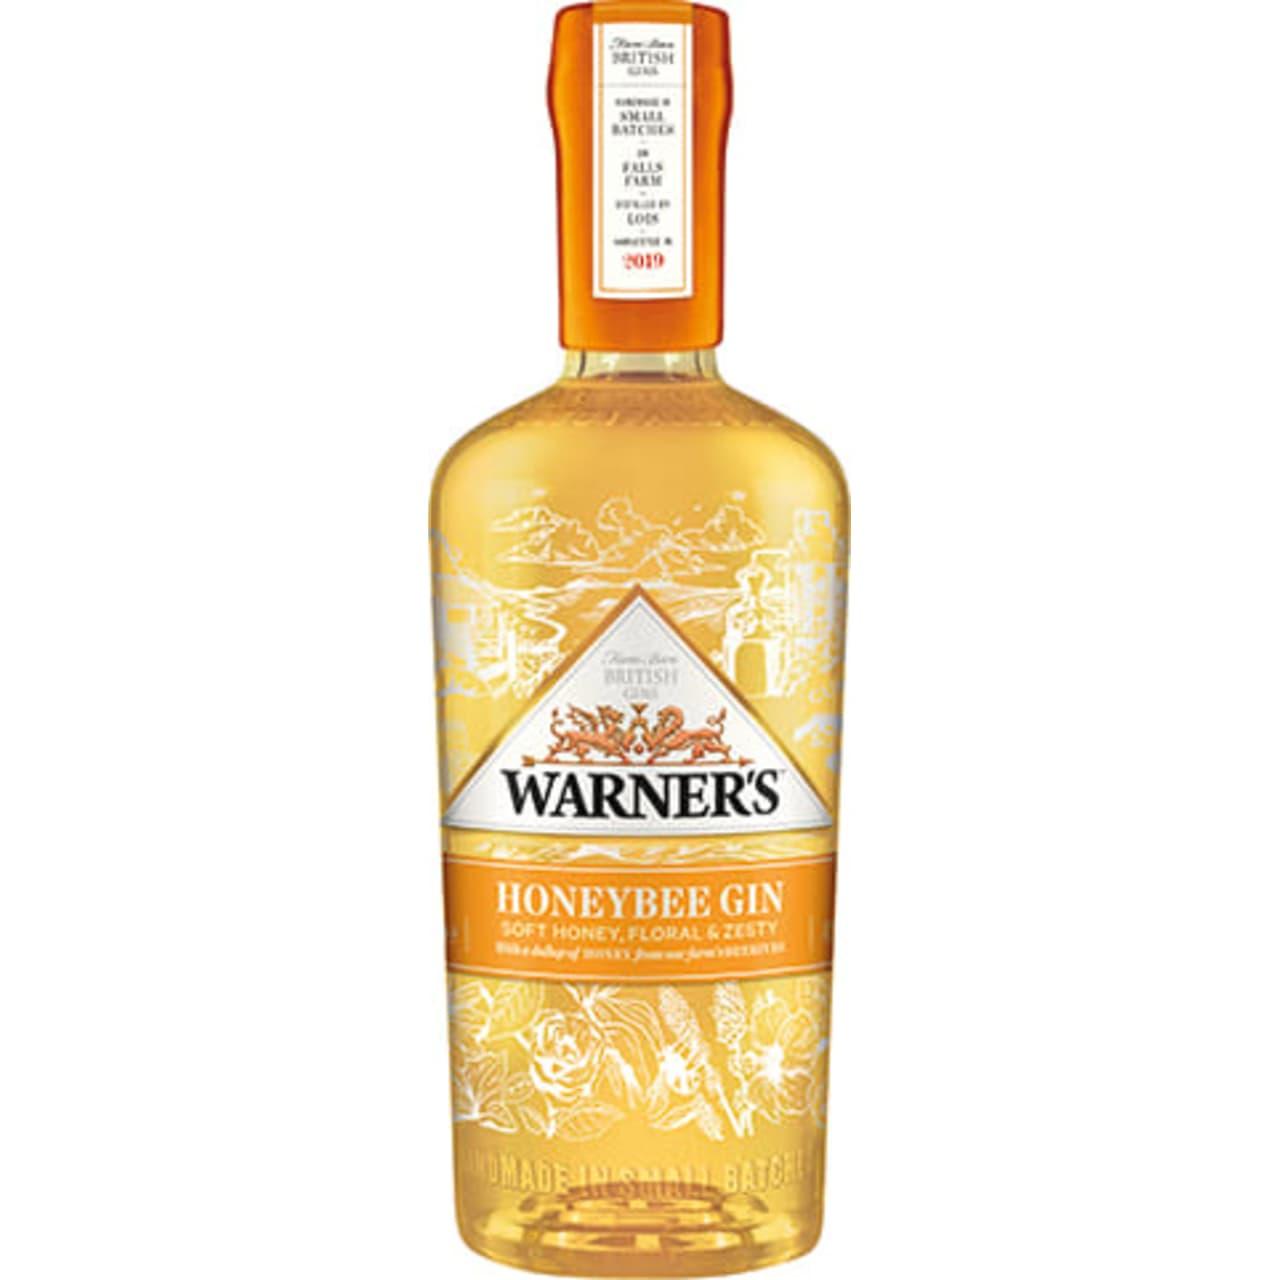 Product Image - Warner's Honeybee Gin